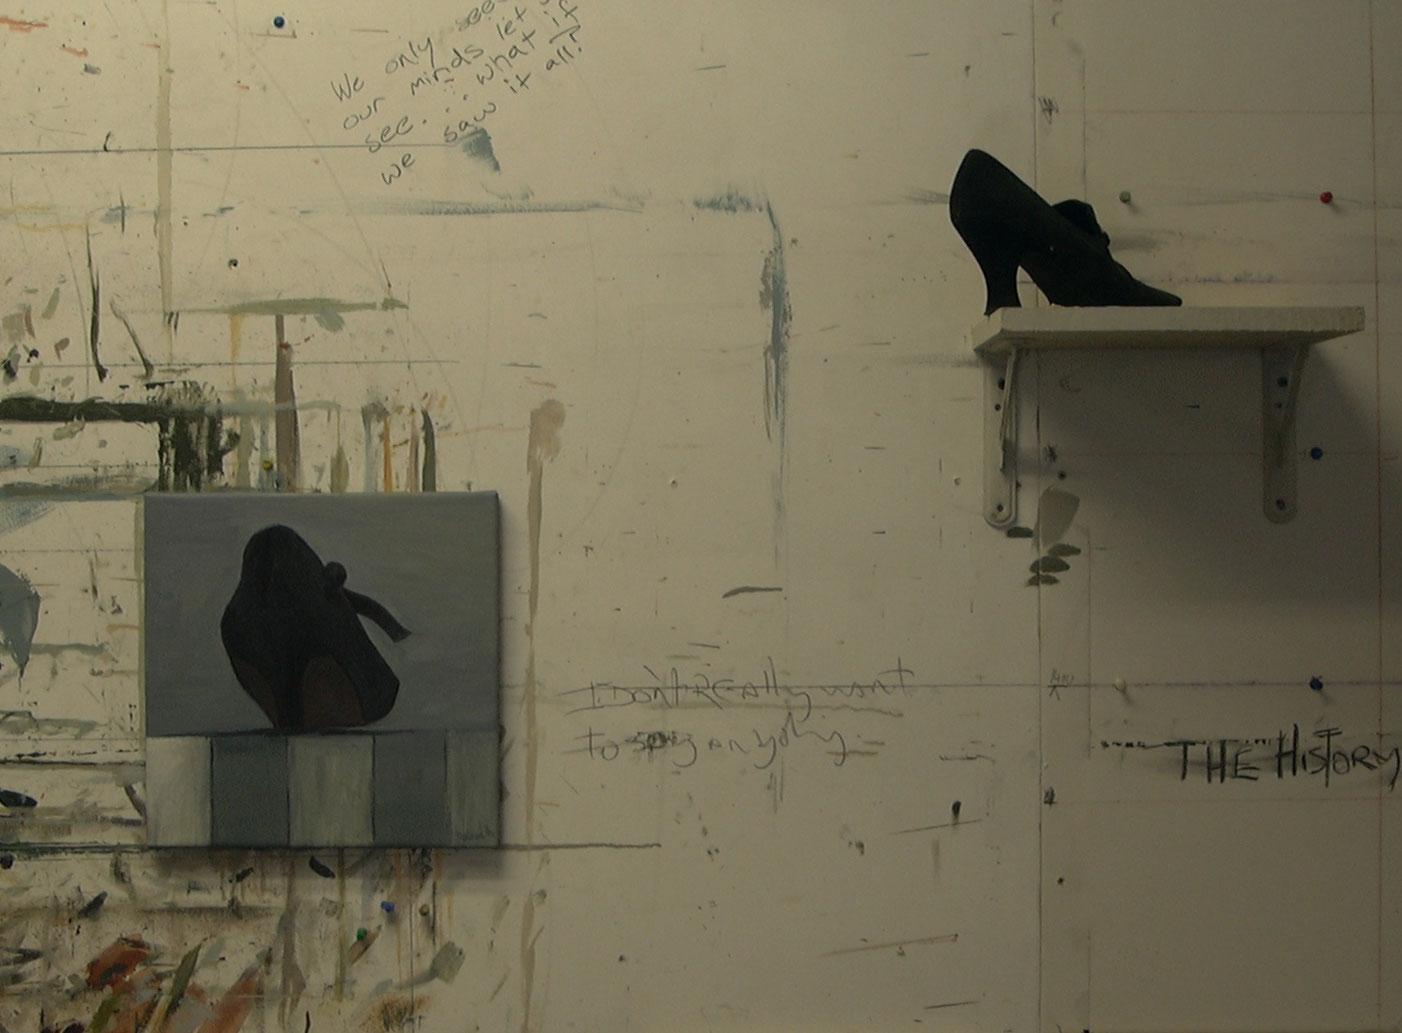 Studio image -2003